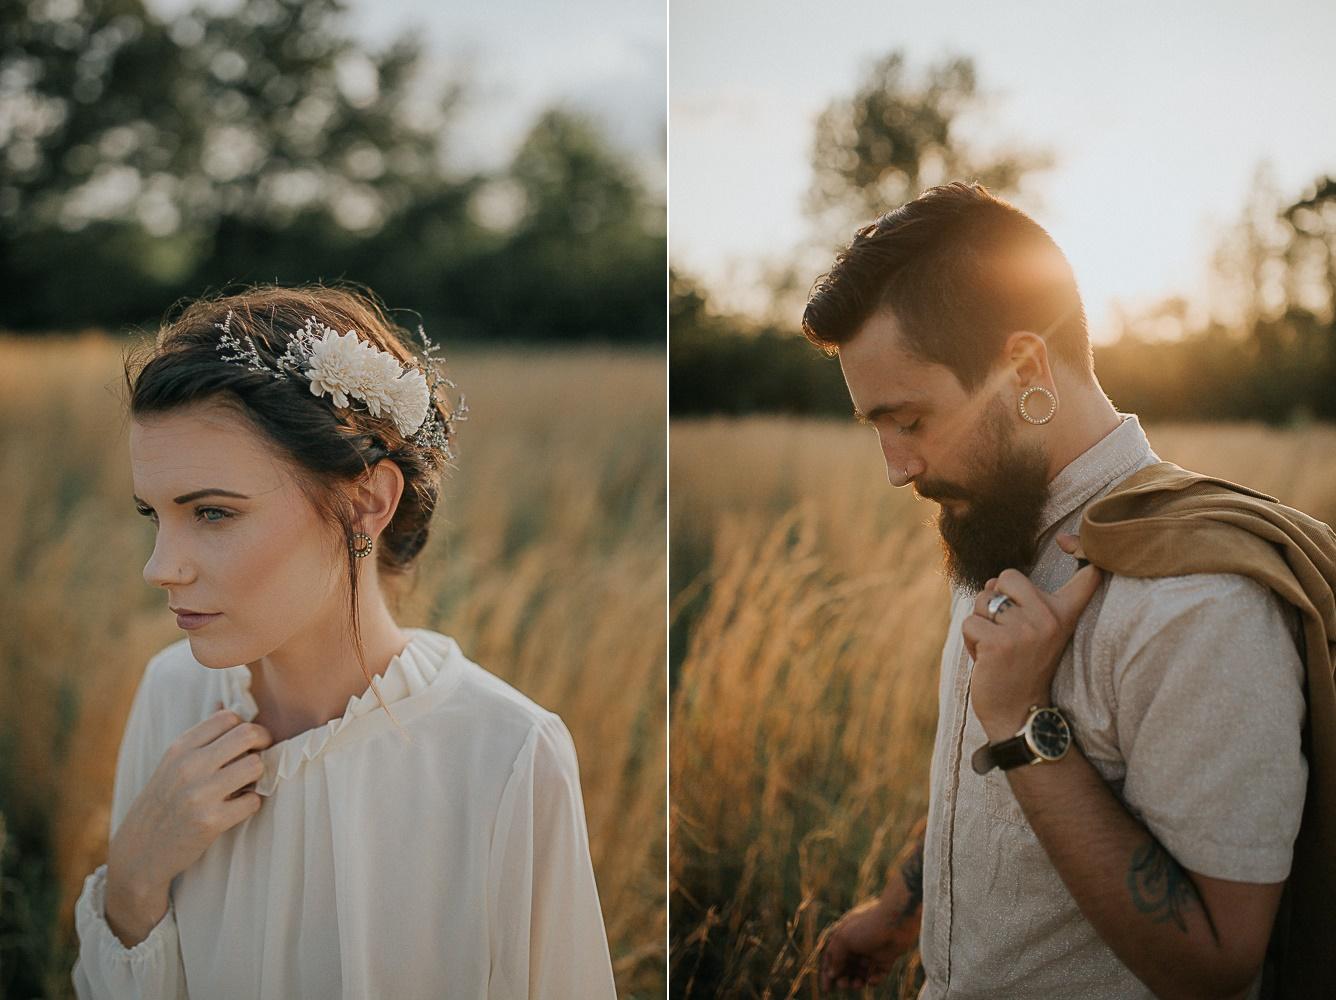 Cassie Cook Photography-Memphis TN-portrait and wedding photographer -6842-horz.jpg